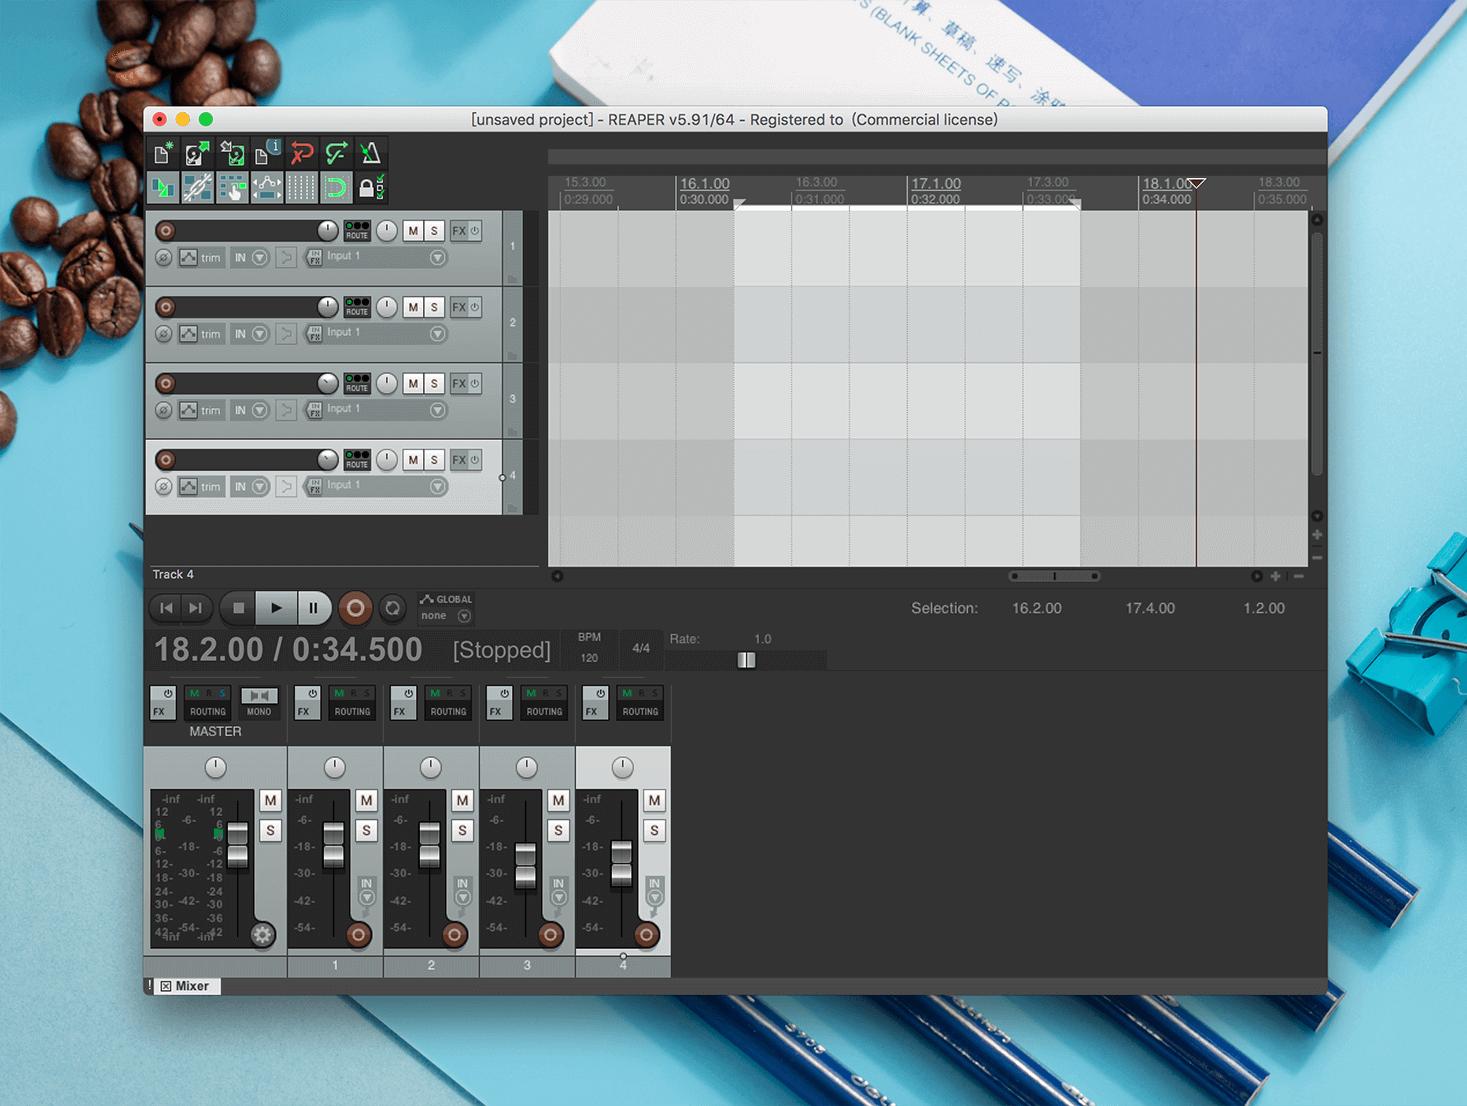 Cockos REAPER 5.91音频录制编辑工具